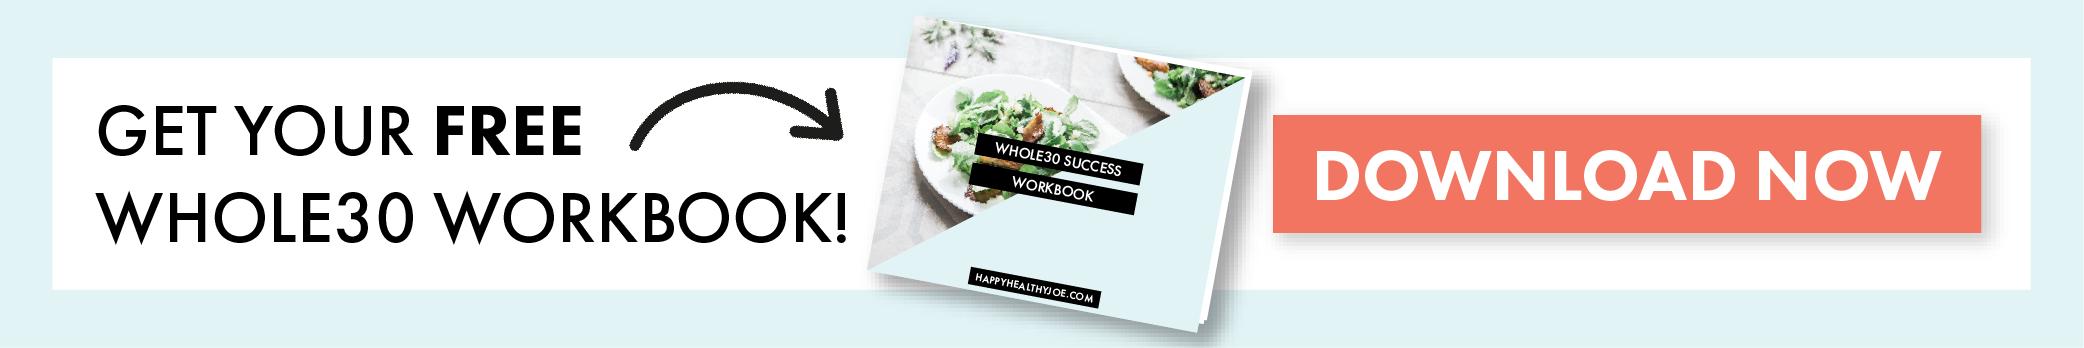 Get Your Free Whole30 Workbook | Happy Healthy Joe | Integrative Health Coach